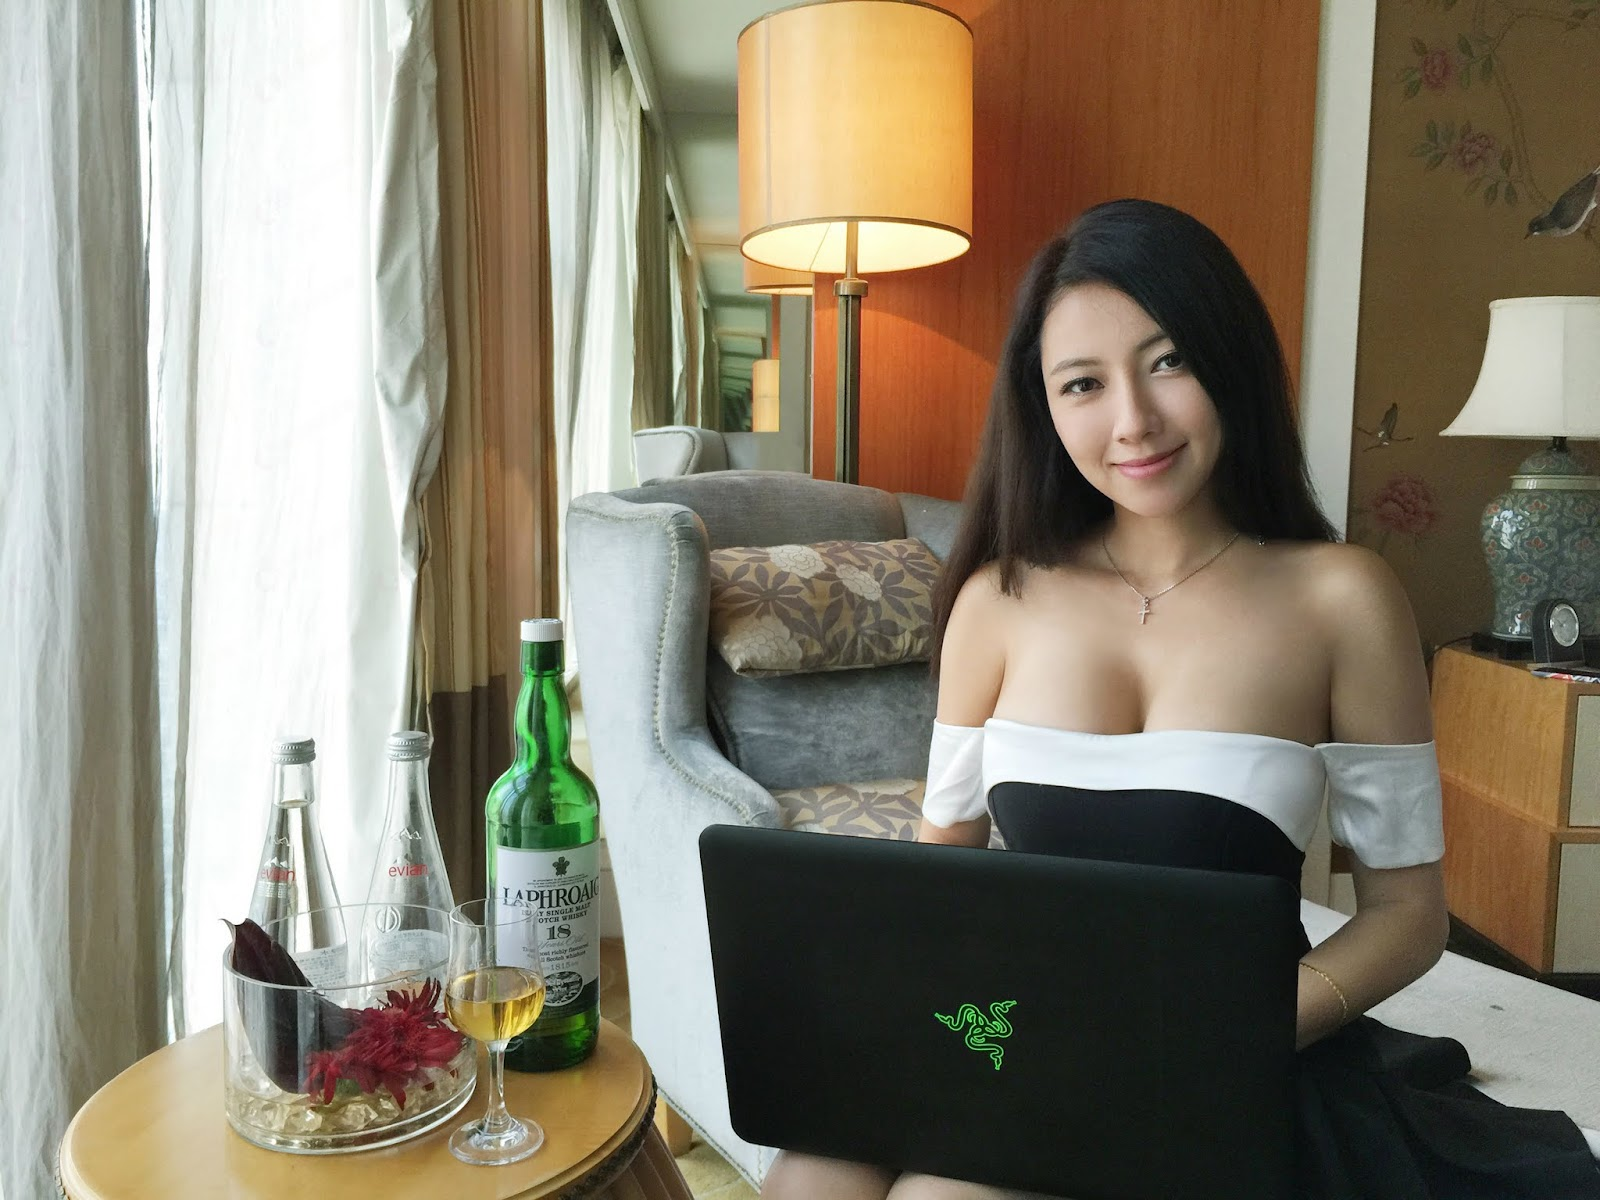 %252B%25C2%25A6v%25C2%25A6%25C2%25B7 04 meitu 4 - Sexy Girl Model TUIGIRL NO.58